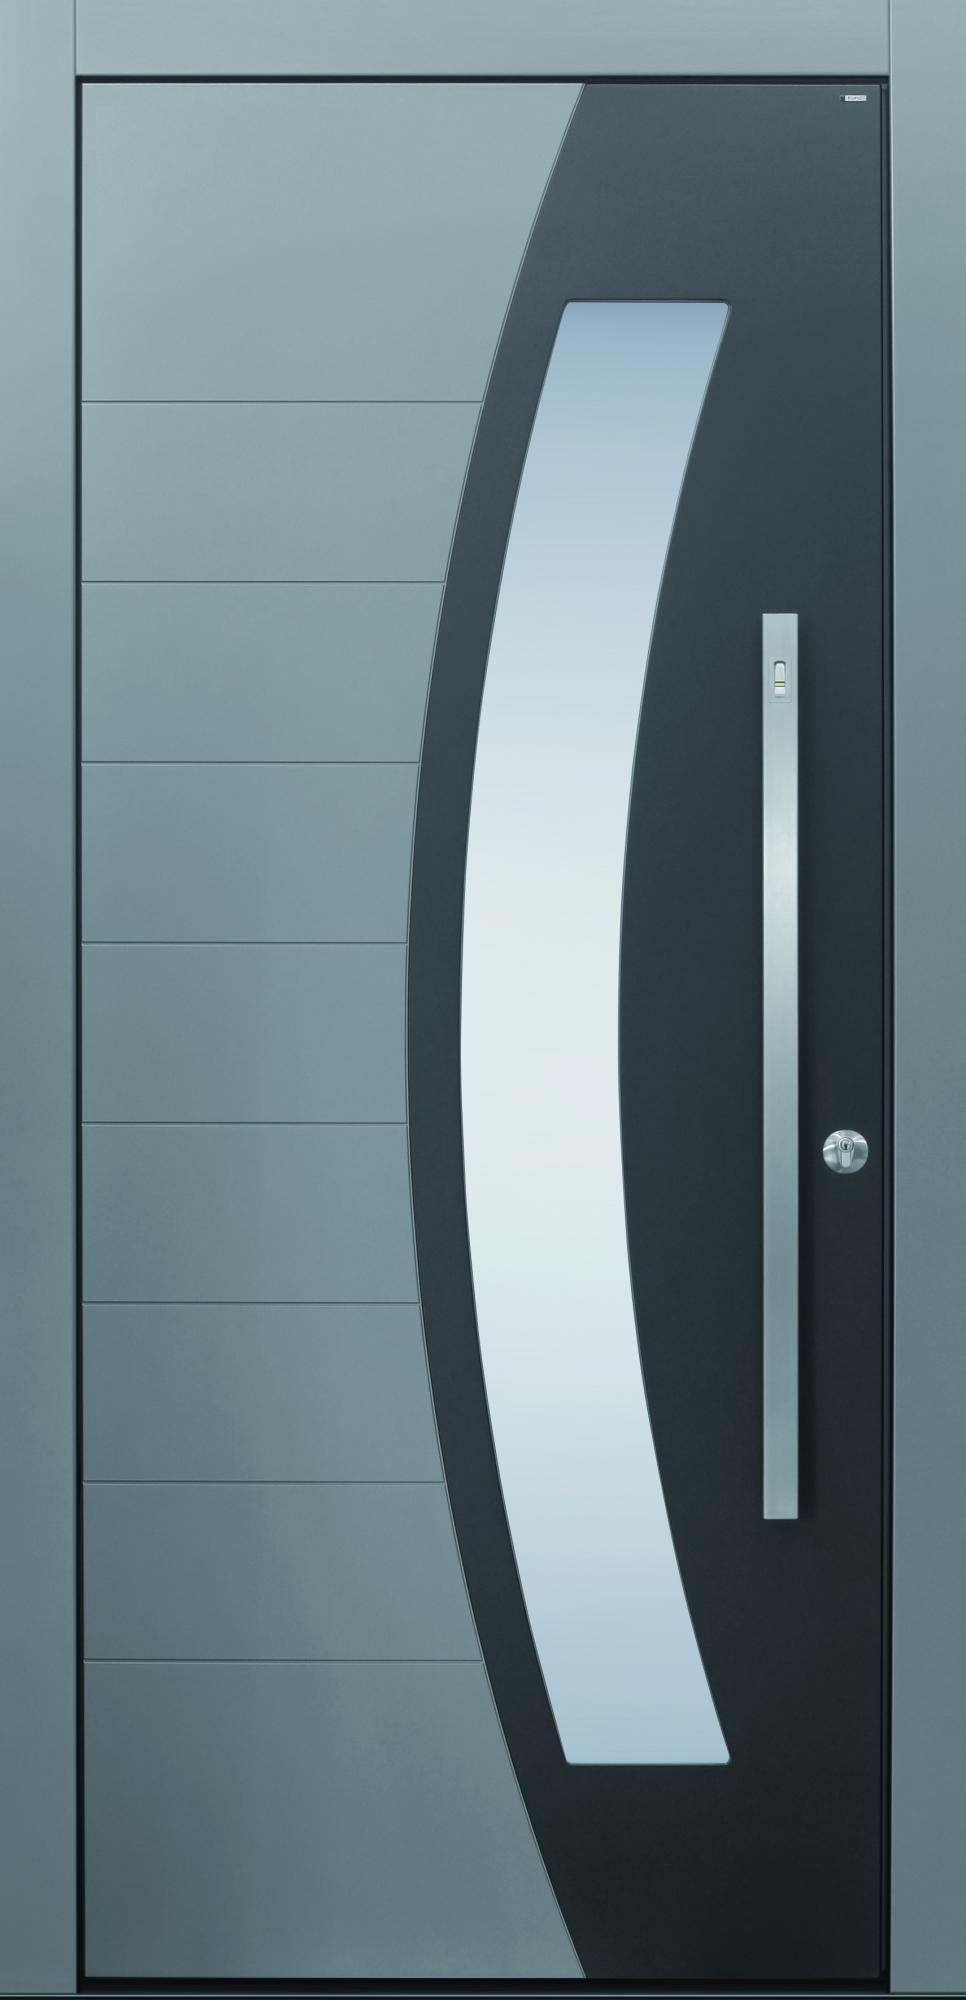 Haustüren modern grau  Haustüren mit rundem Lichtausschnitt | TOPIC Haustüren u ...